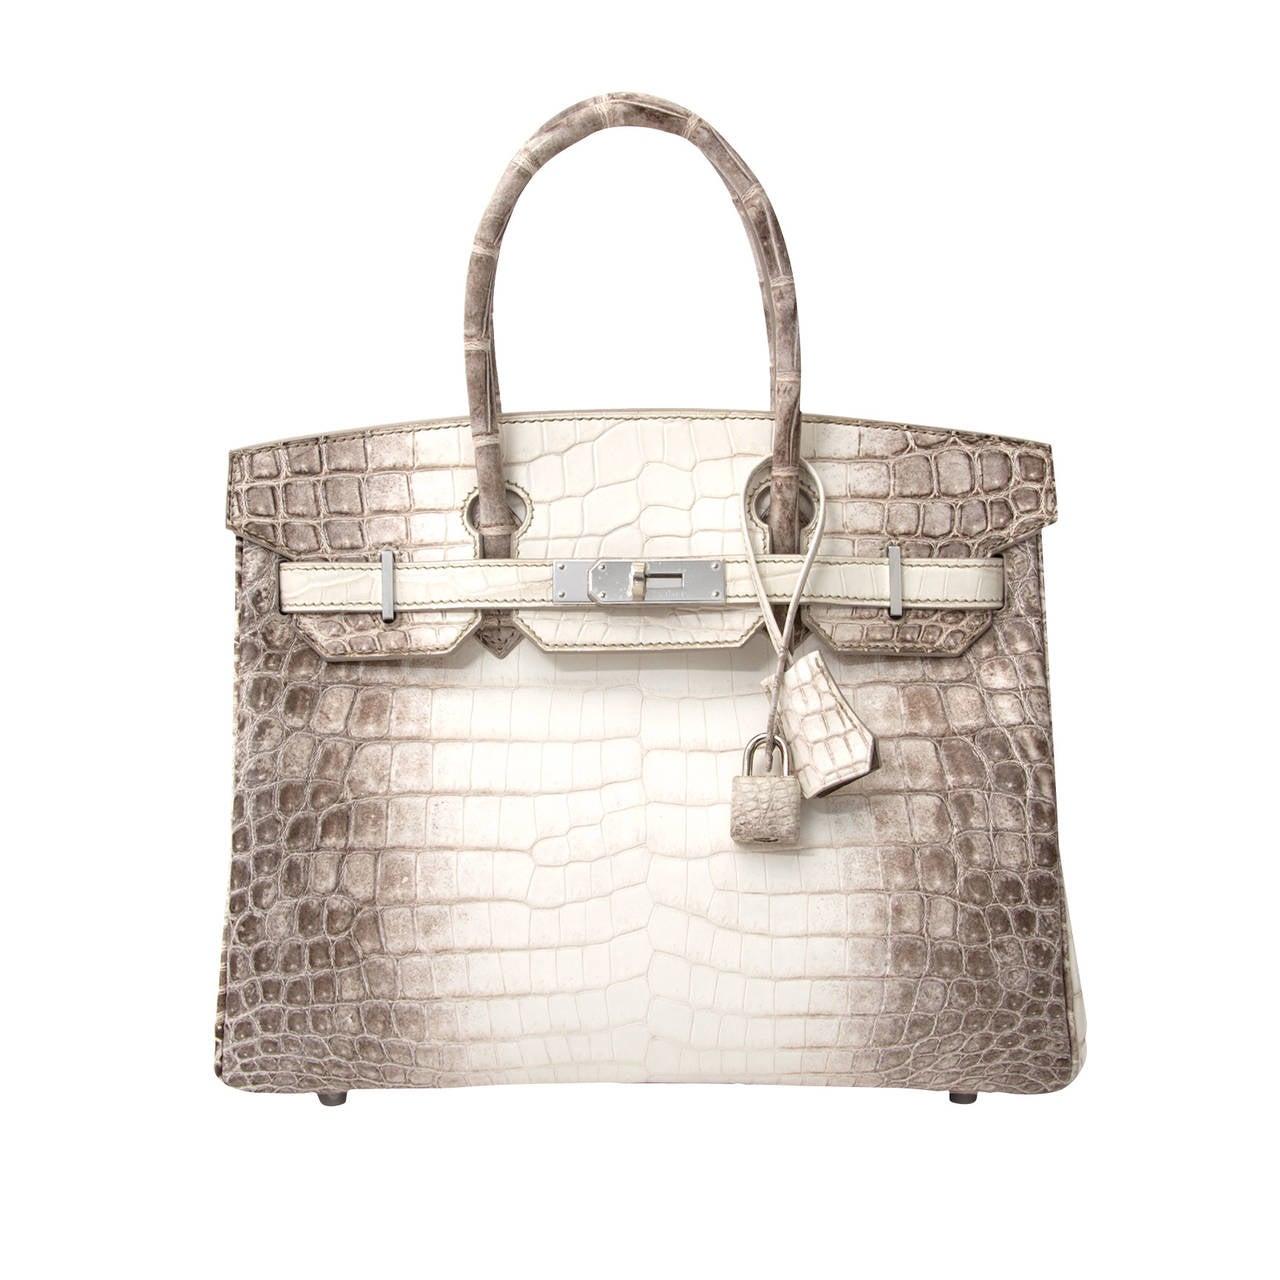 herm s birkin bag crocodile niloticus himalaya handbag white phw 30 at 1stdibs. Black Bedroom Furniture Sets. Home Design Ideas